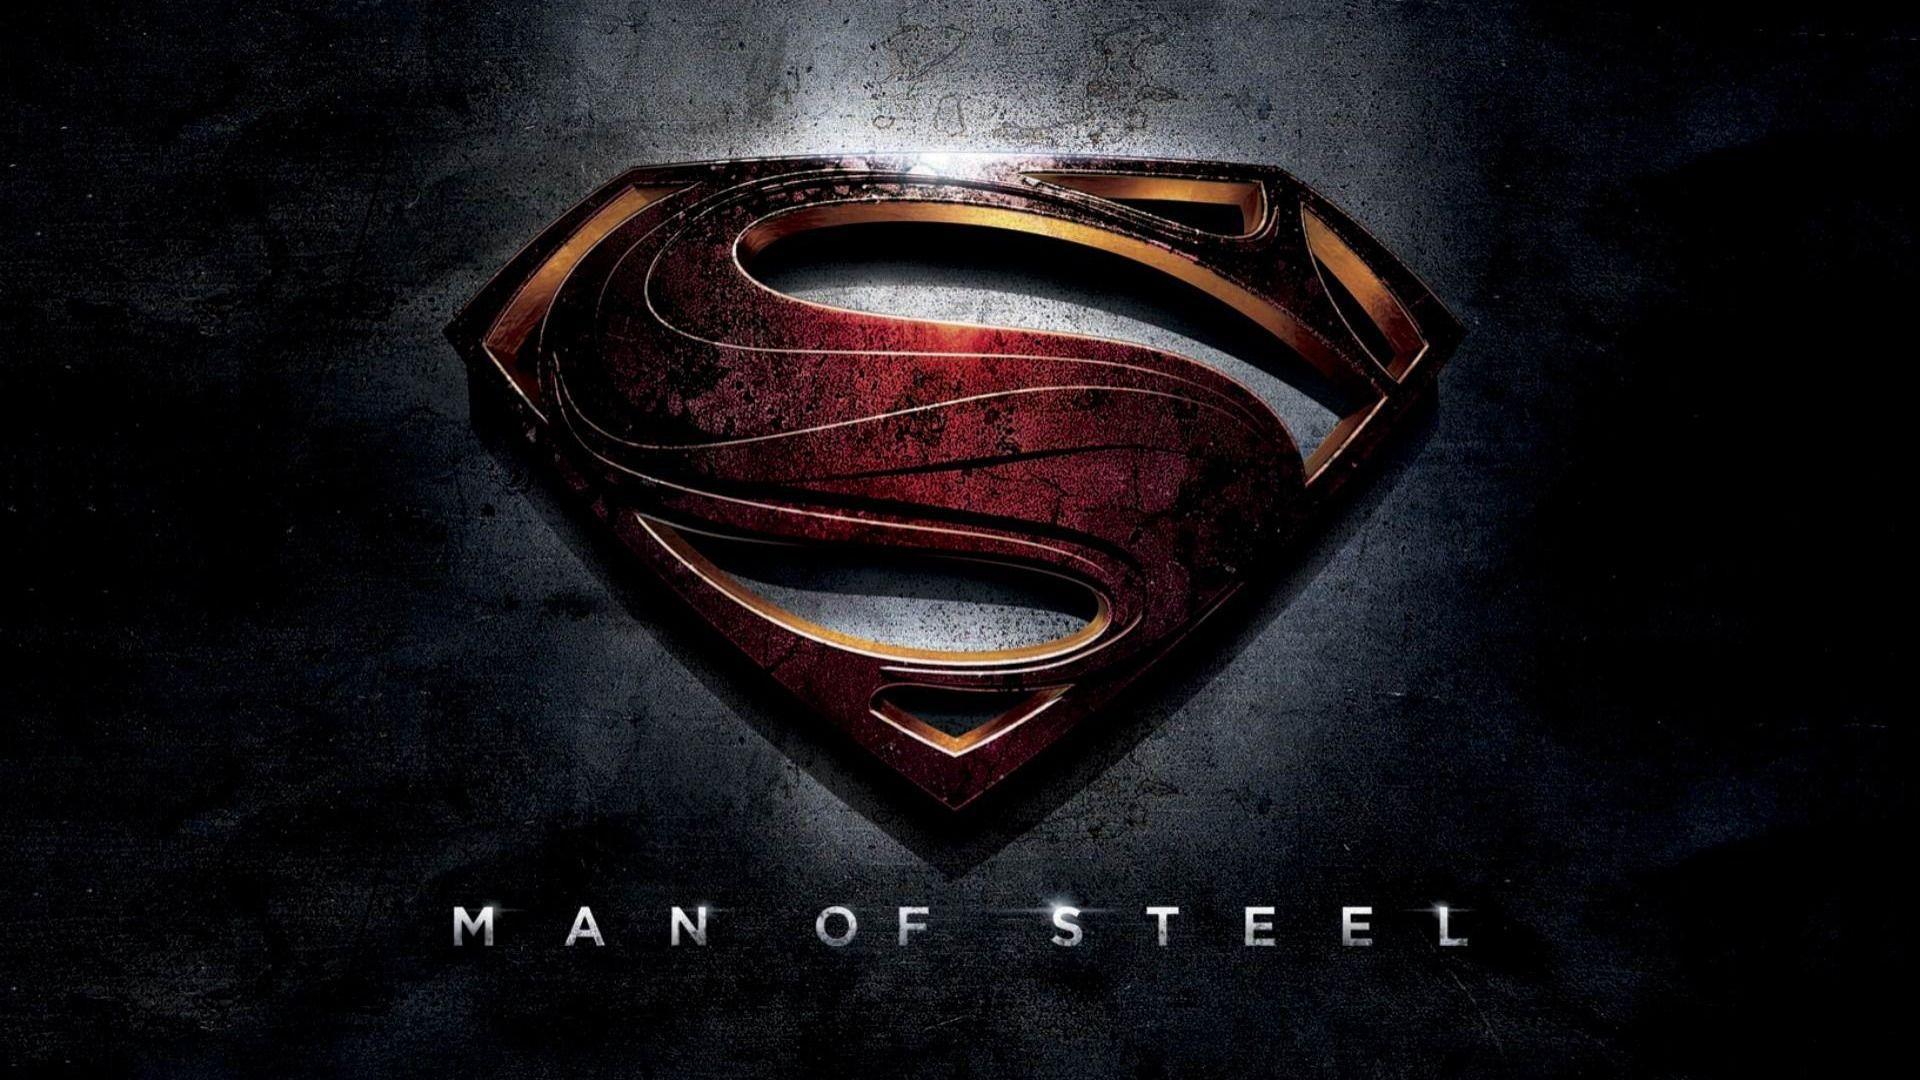 Superman wallpapers 1920x1080 wallpaper cave - Wallpaper superman man of steel ...